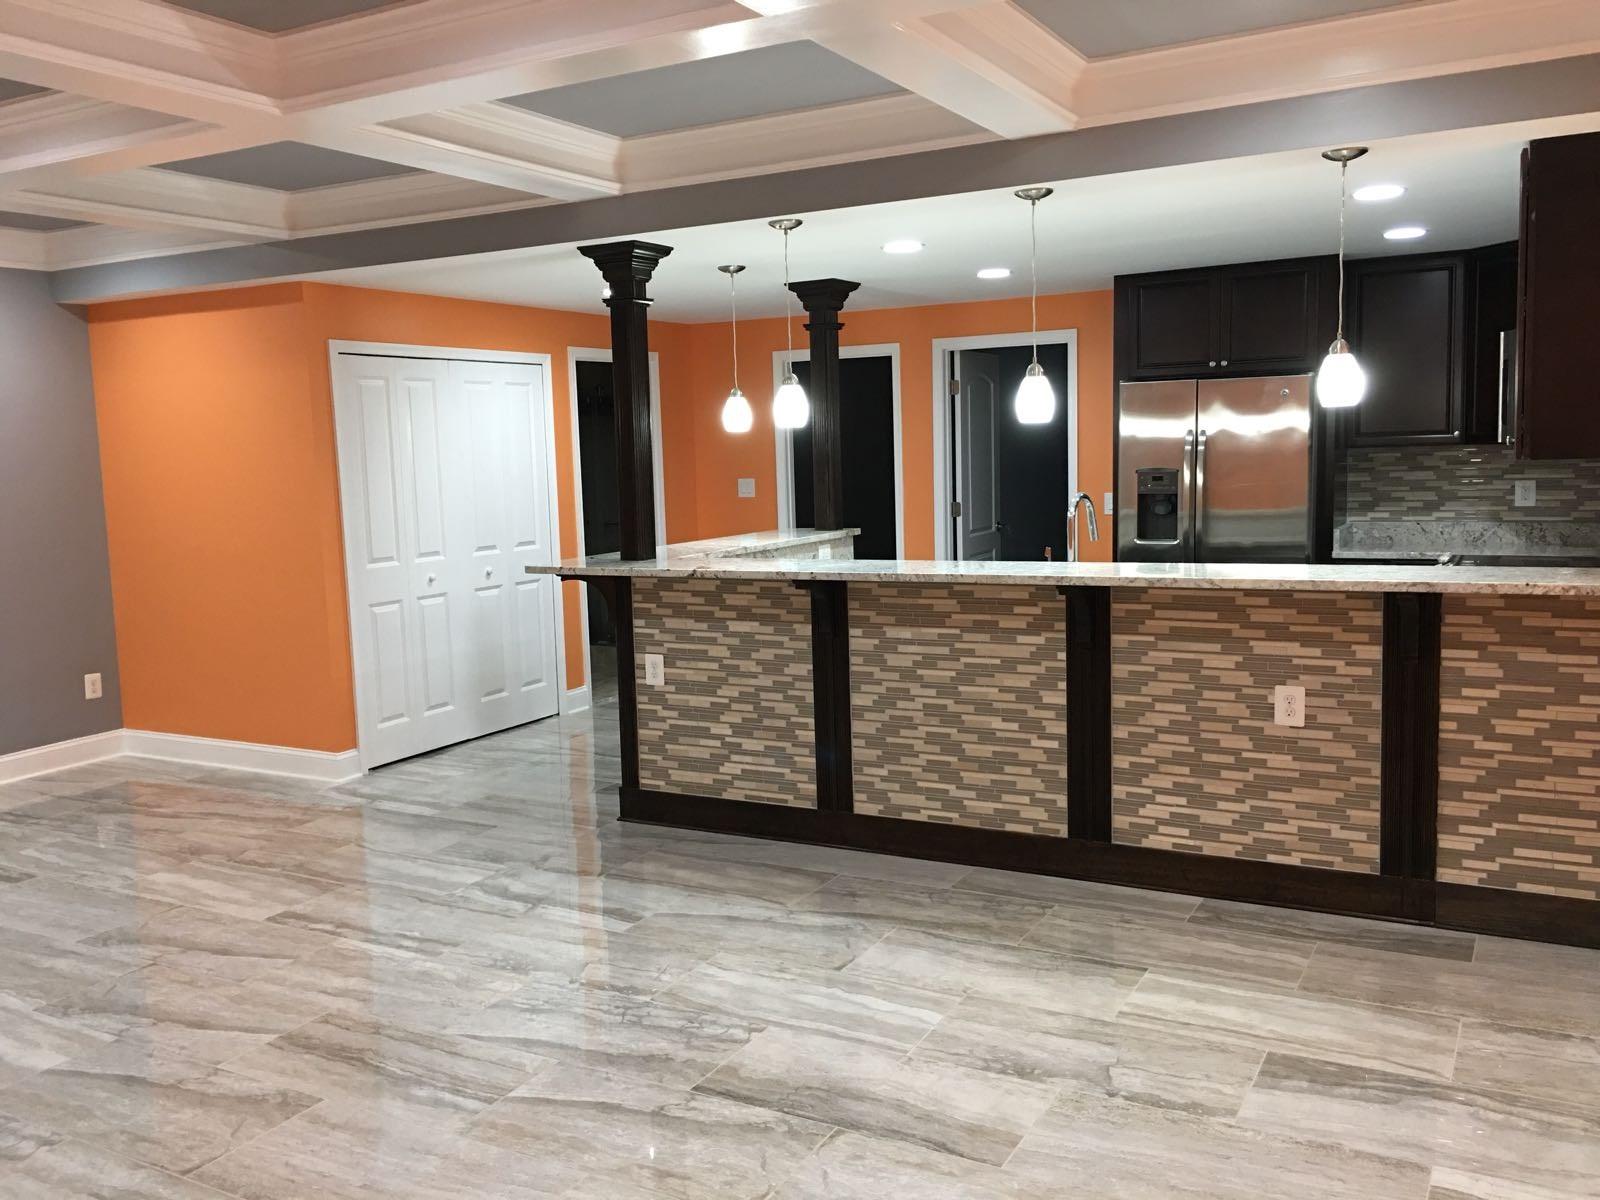 basement apartment for rent. Beautiful Basement Apartment For Rent Find basement for in Kensington  MD Sulekha Rentals